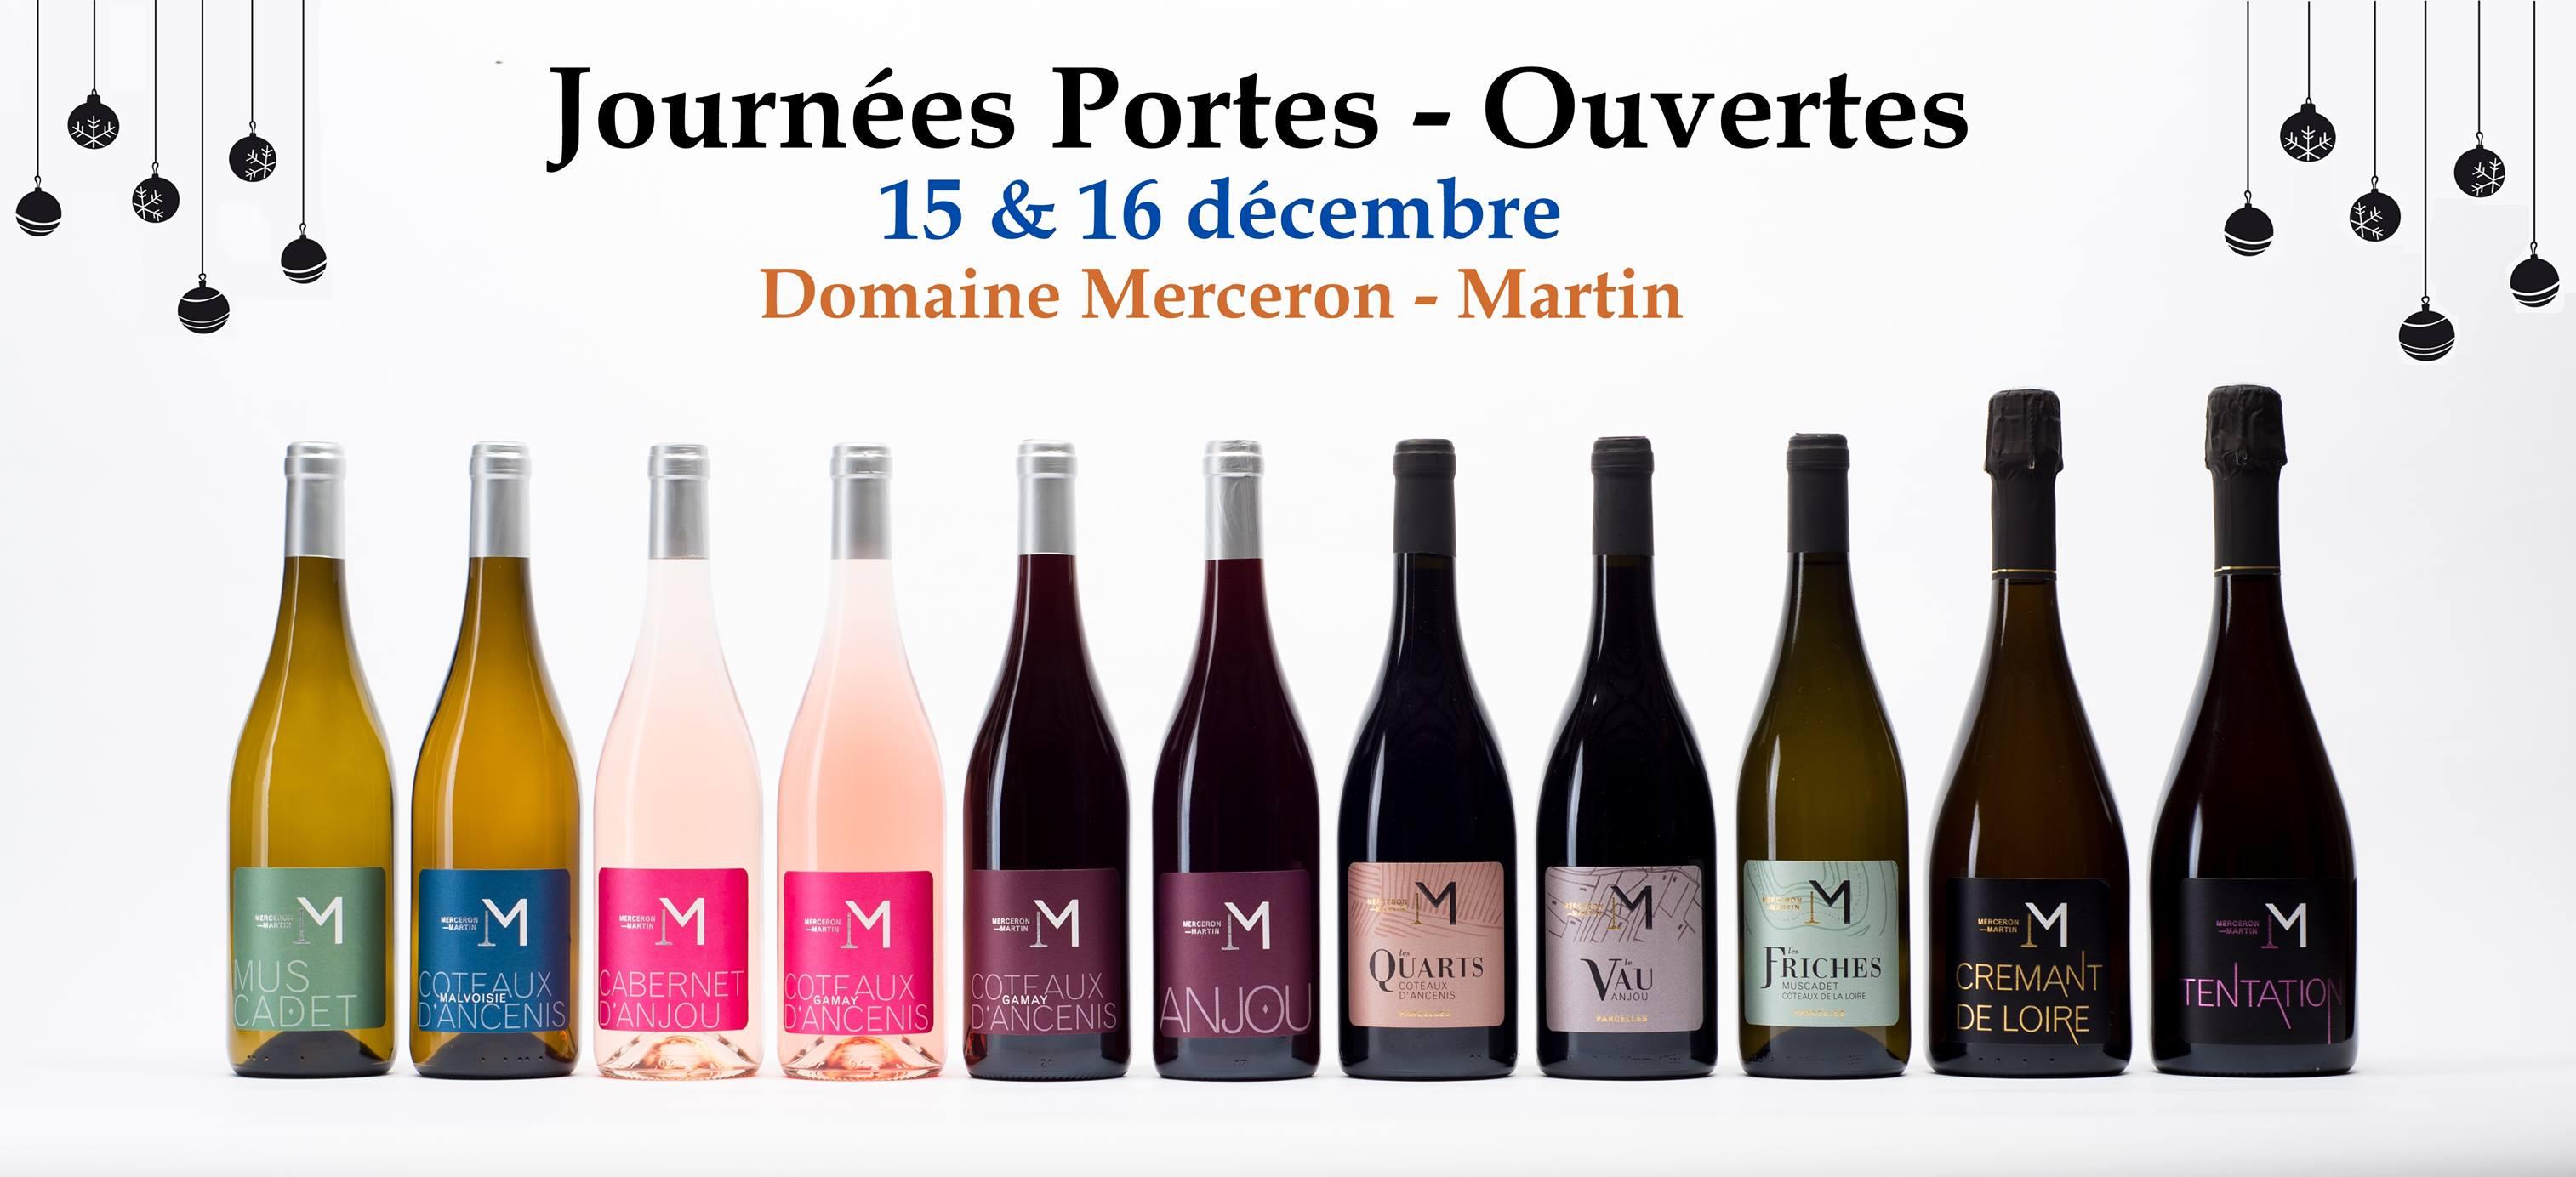 PO Domaine Merceron Martin 15 et 16.12 2018